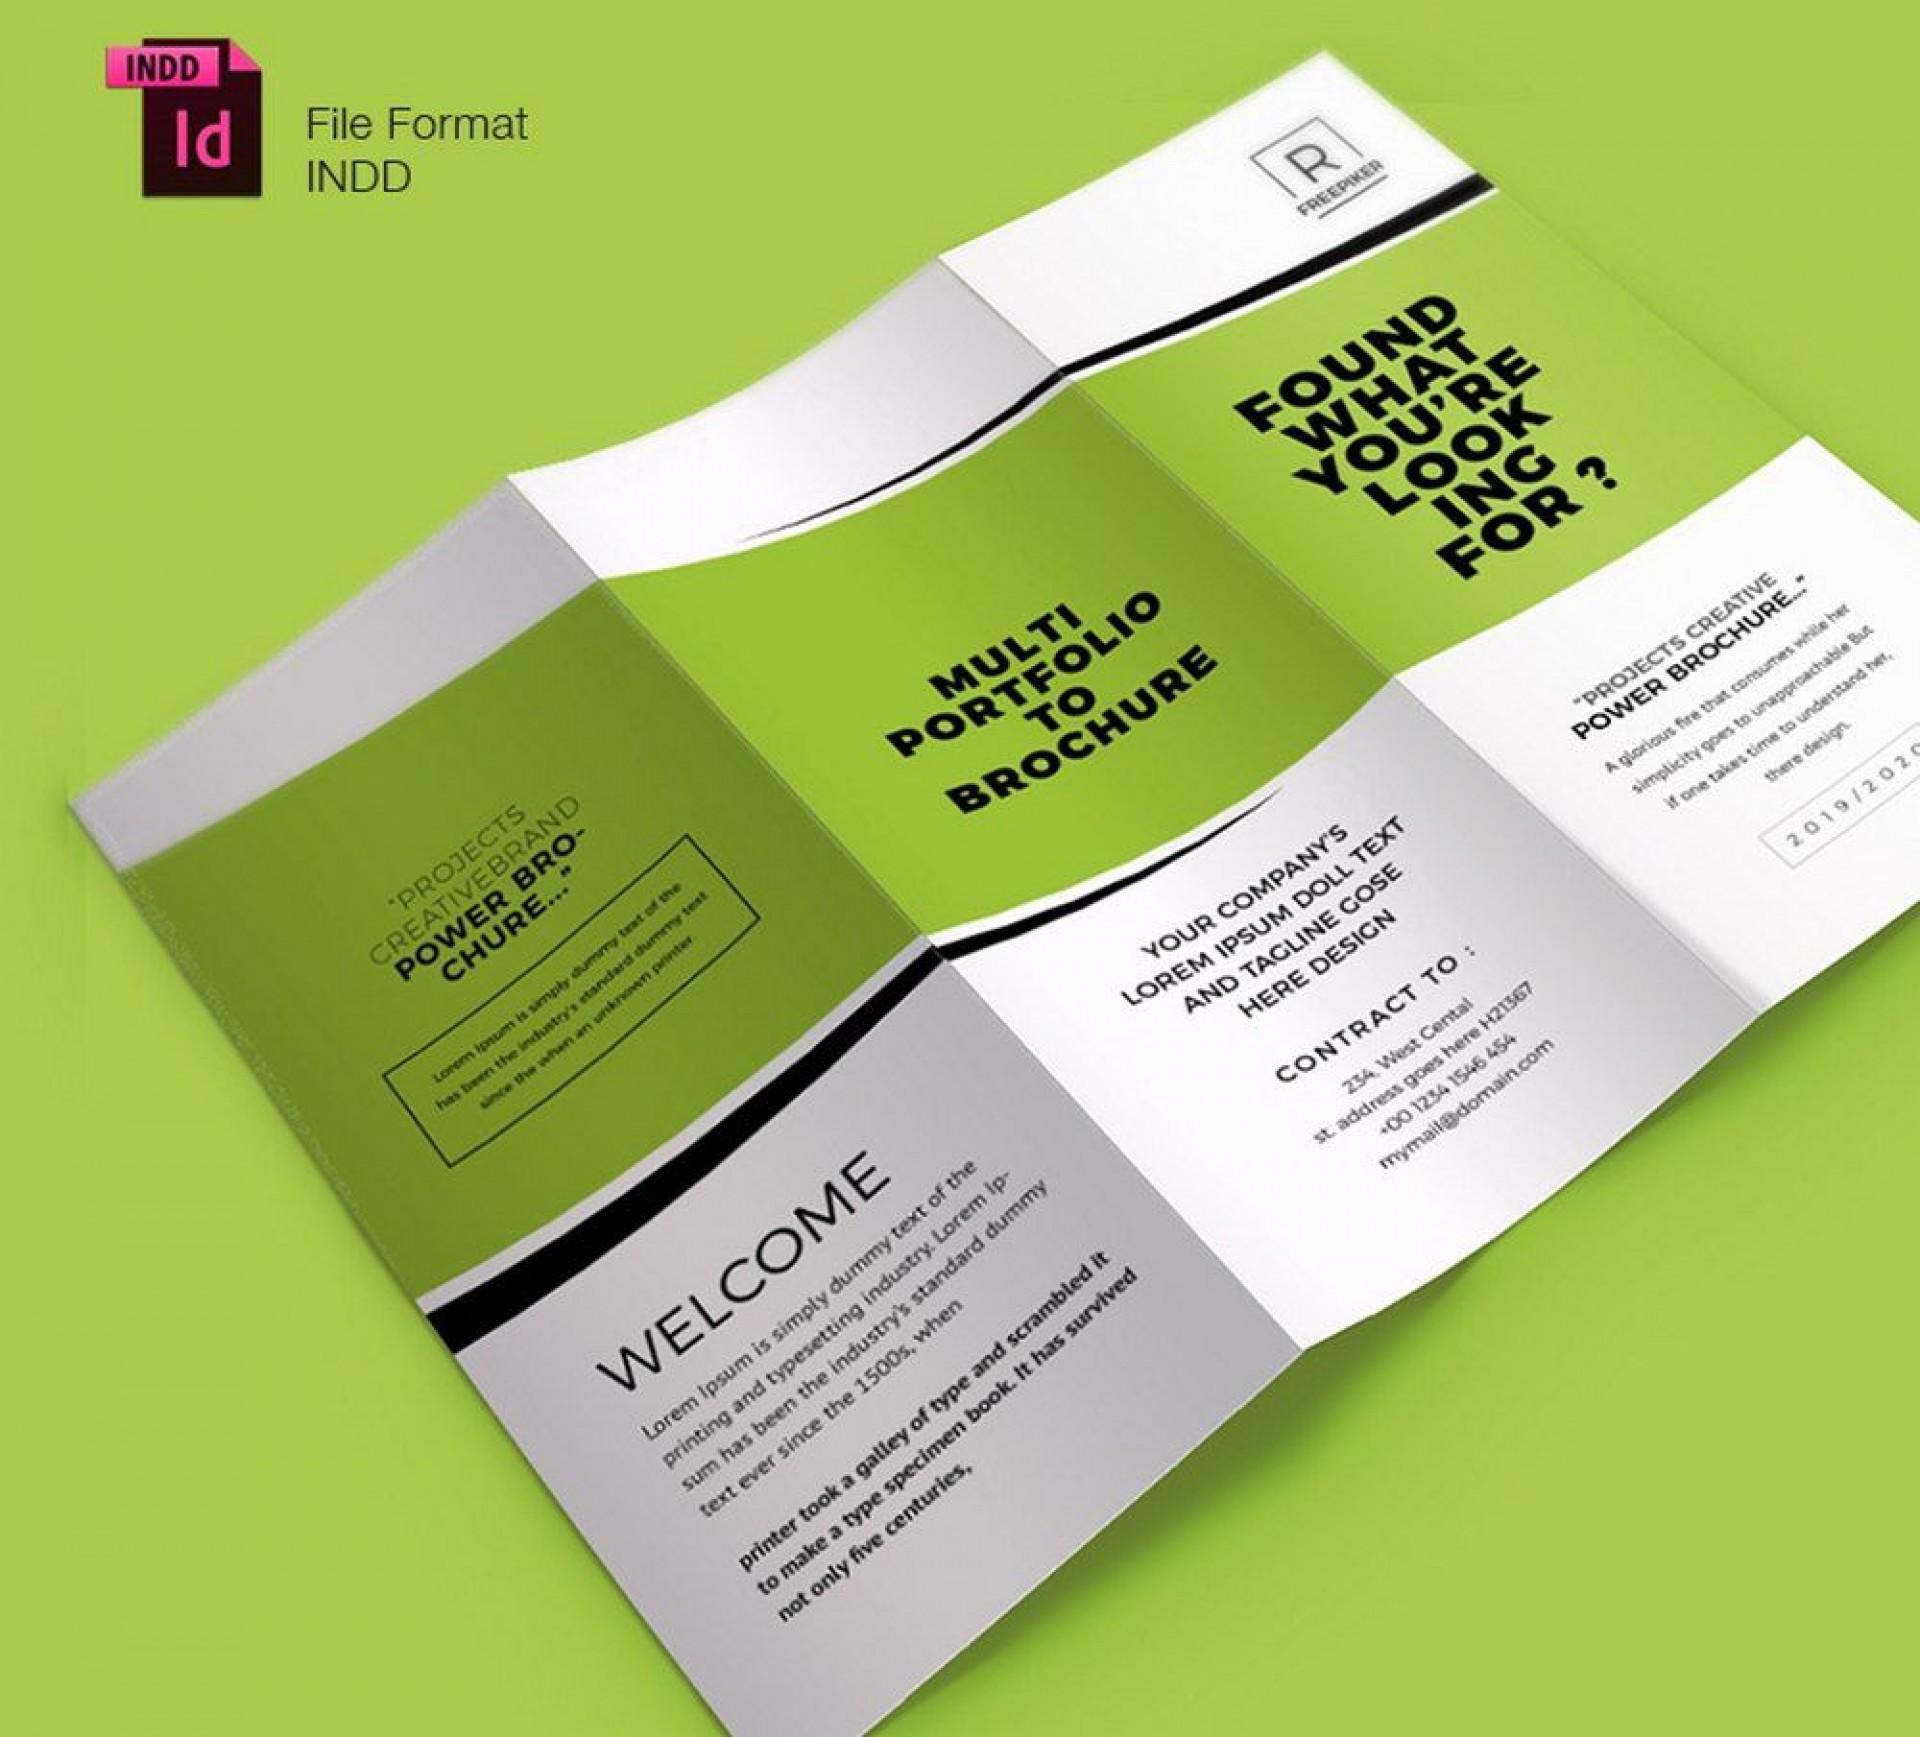 003 Impressive Tri Fold Brochure Template Word Highest Quality  2010 2007 Free1920